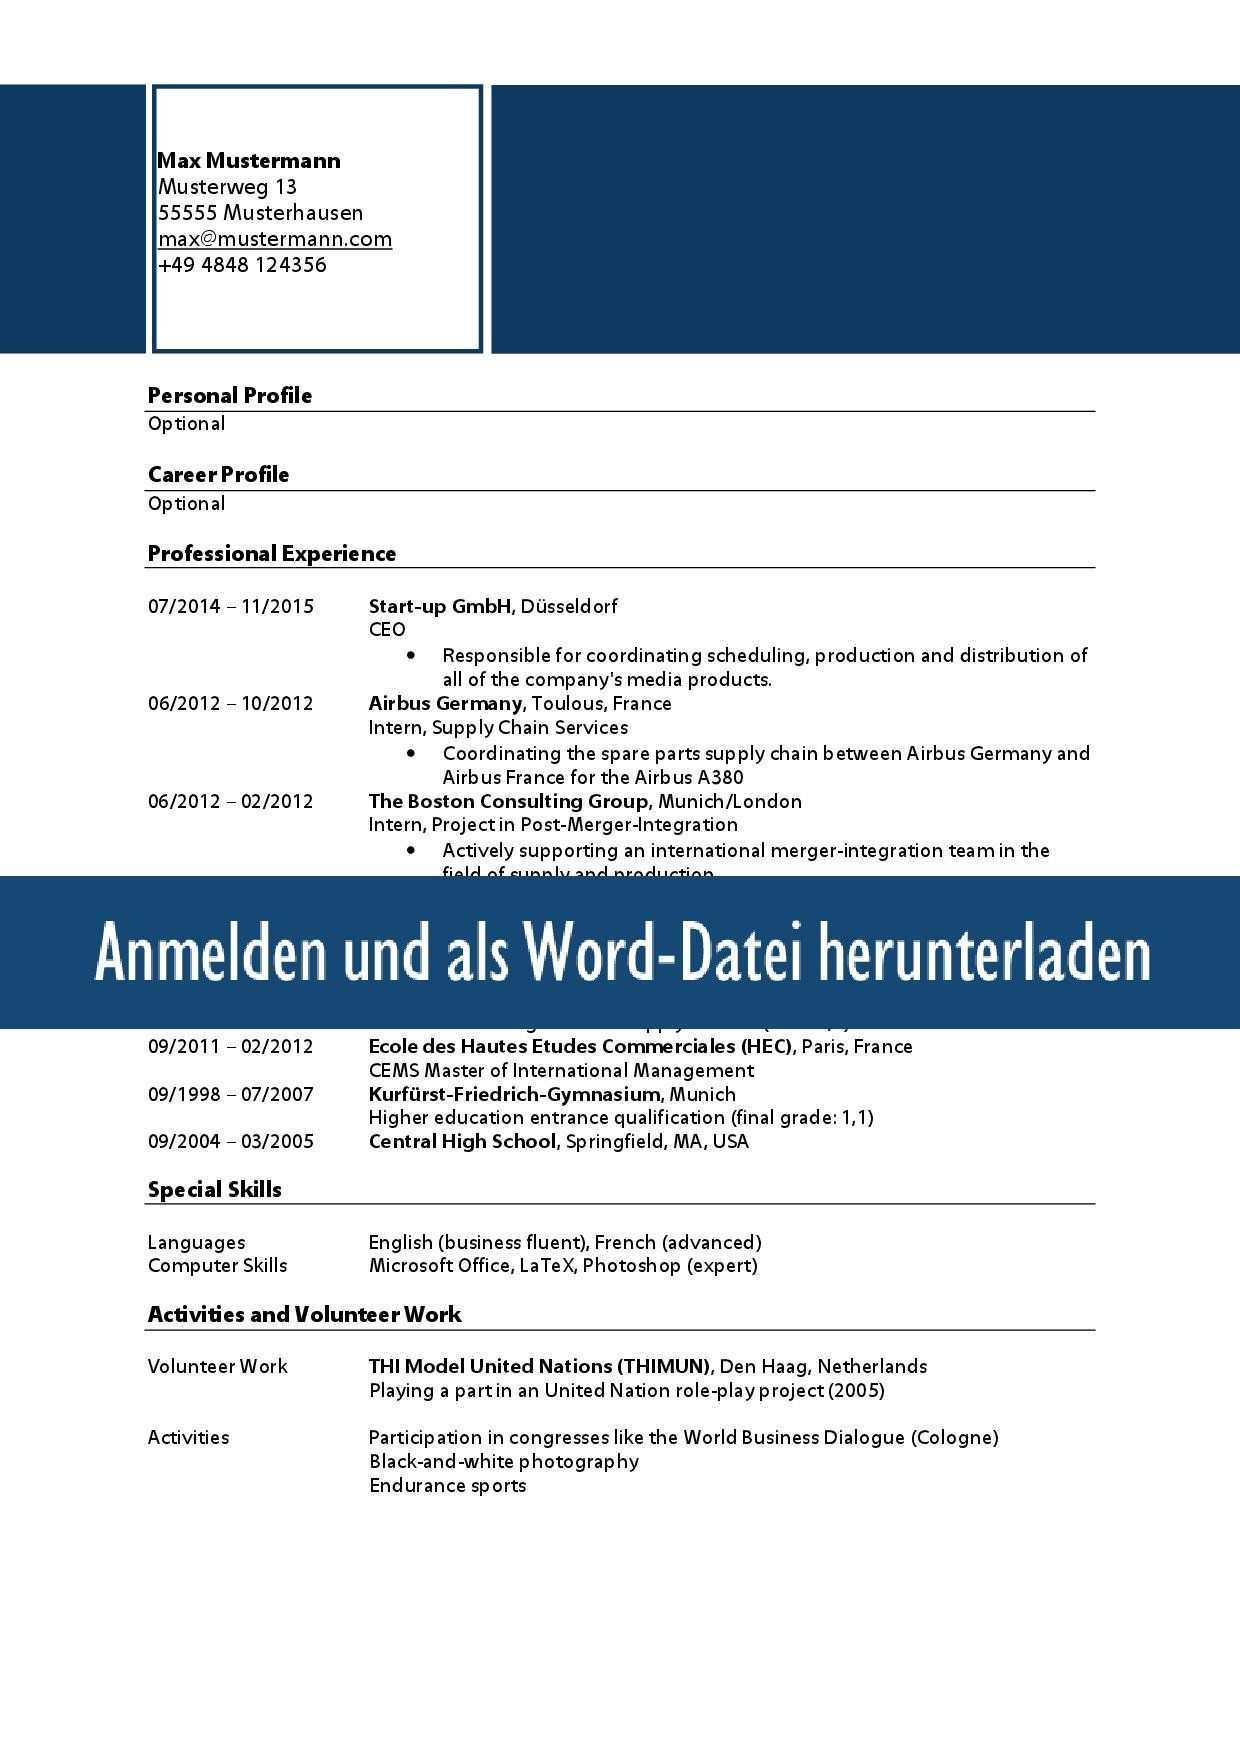 Muster Lebenslauf Word Muster Lebenslauf Englisch Lebenslauf Englisch Muster Word Vorlagen Muster Lebenslau In 2020 Administration Supply Chain Dusseldorf